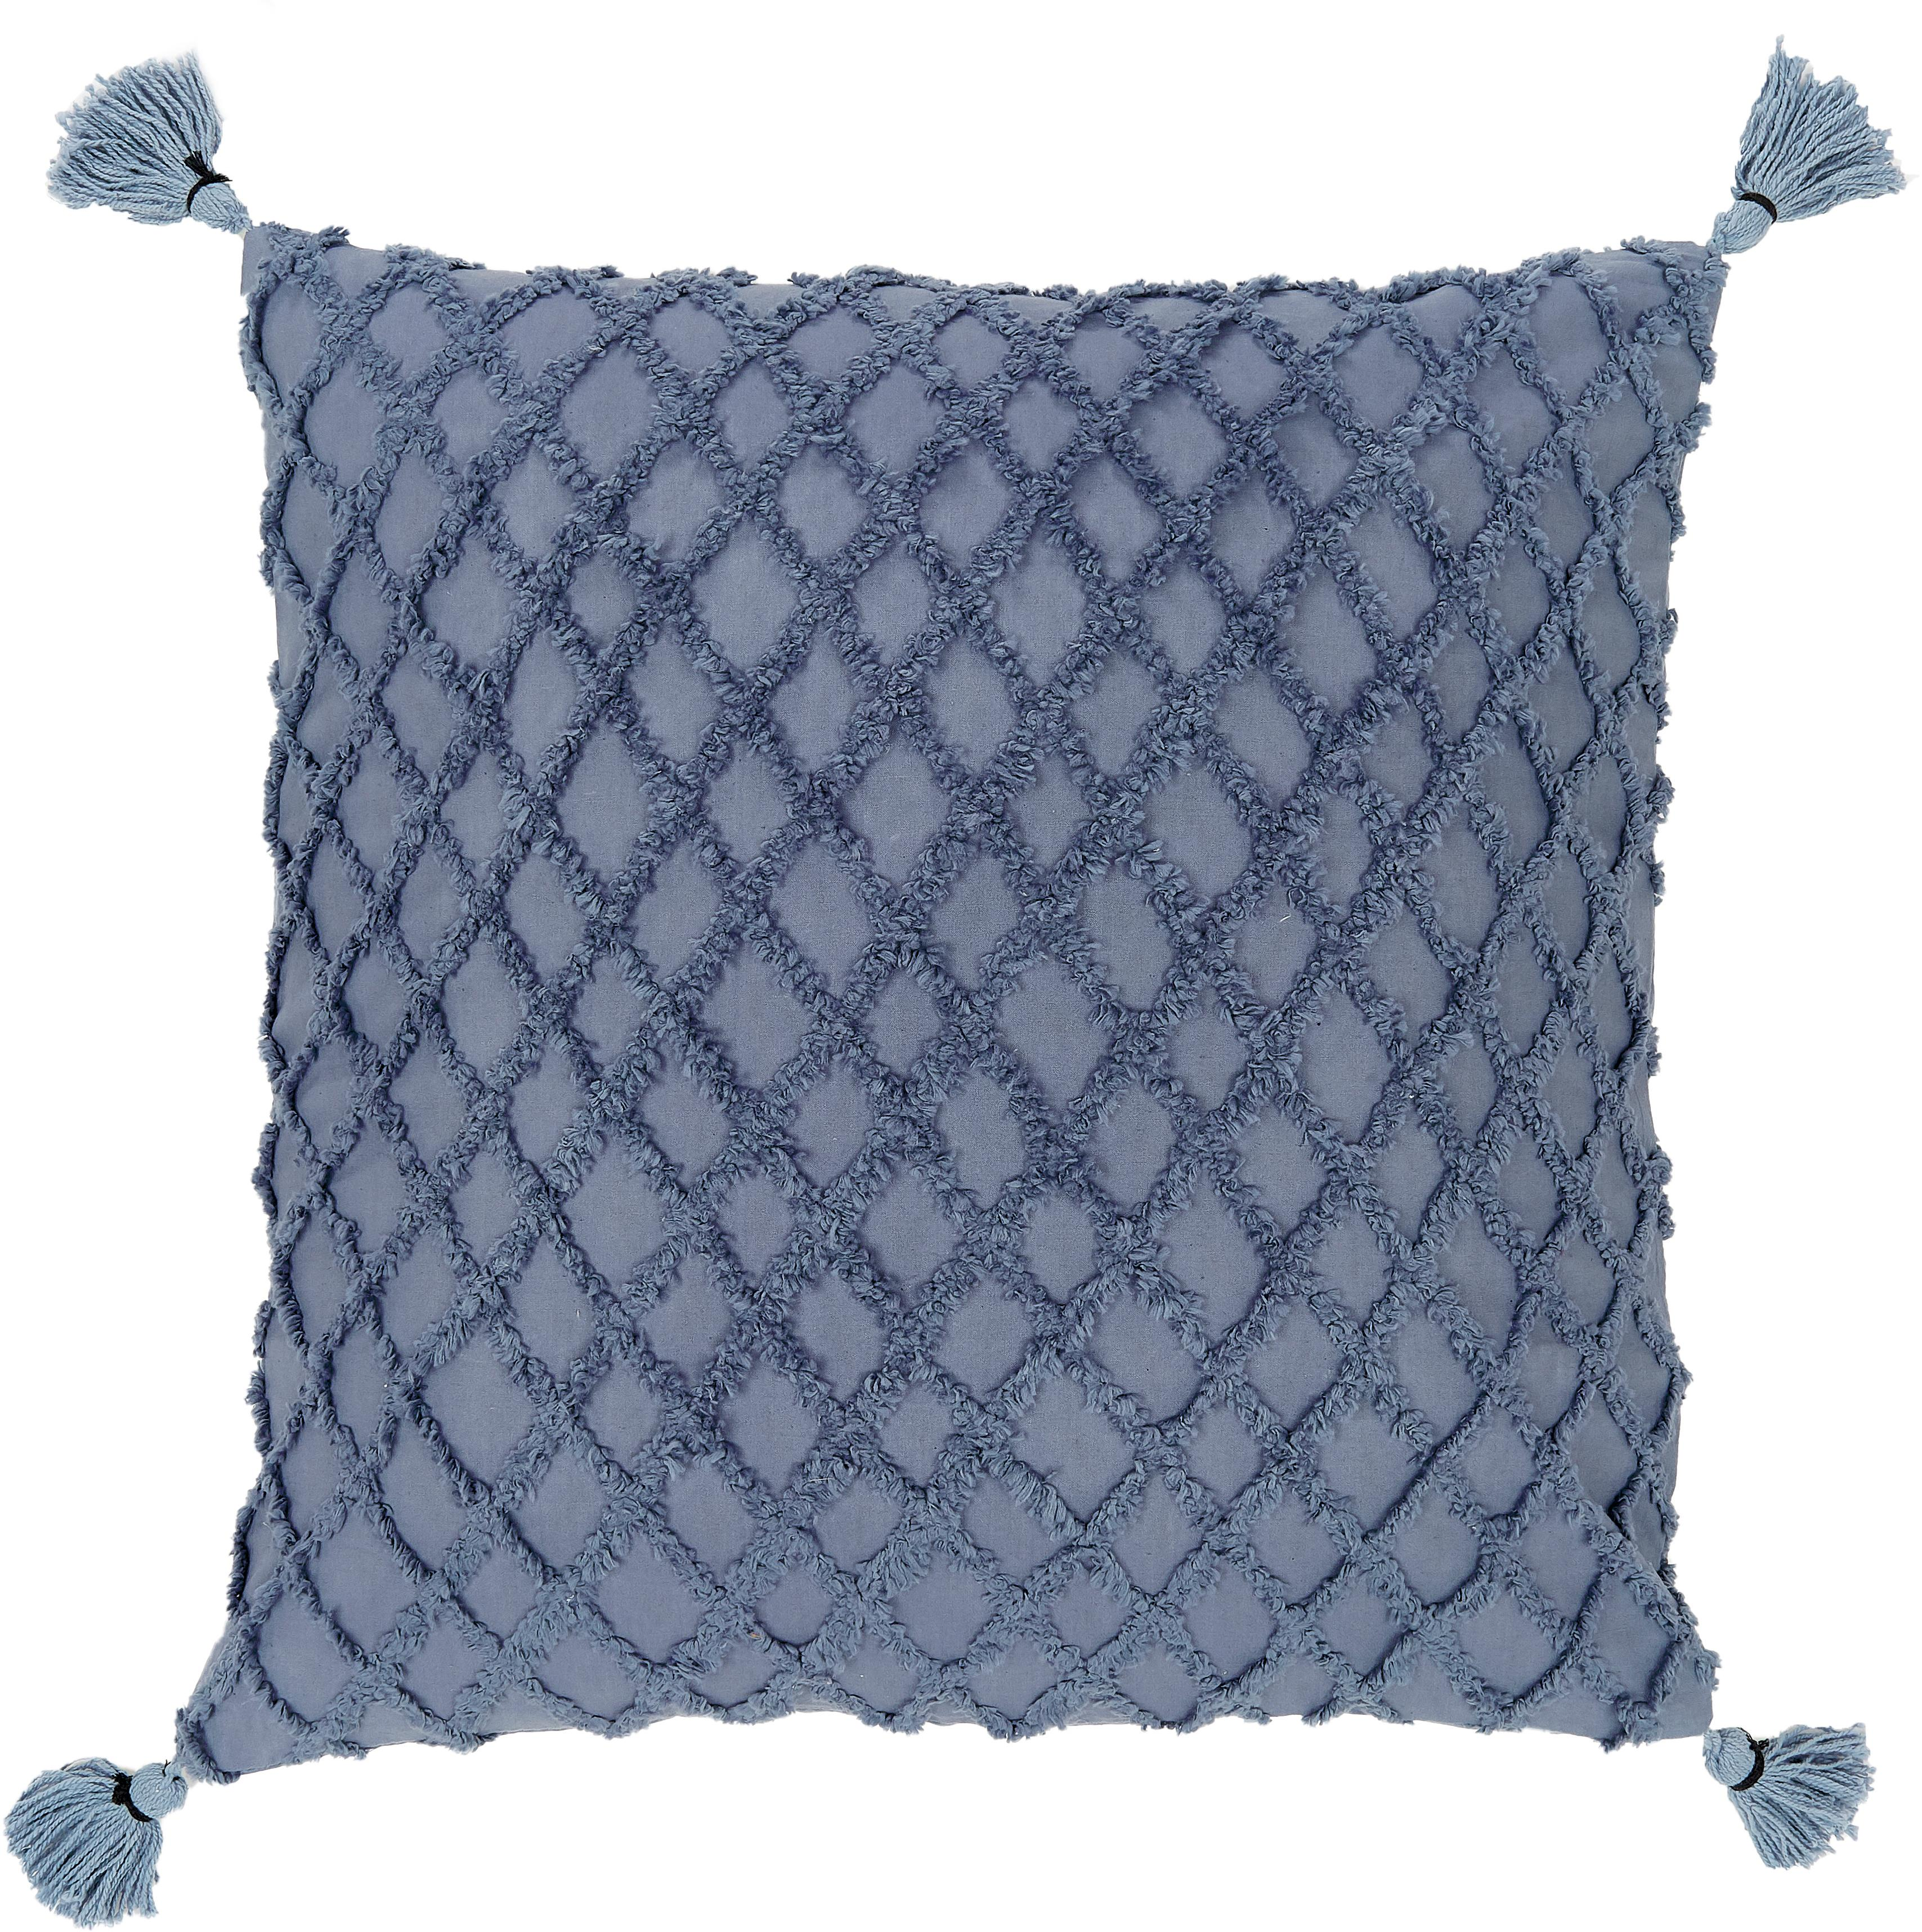 Kussenhoes Royal met hoog-laag patroon, 100% katoen, Blauw, 45 x 45 cm